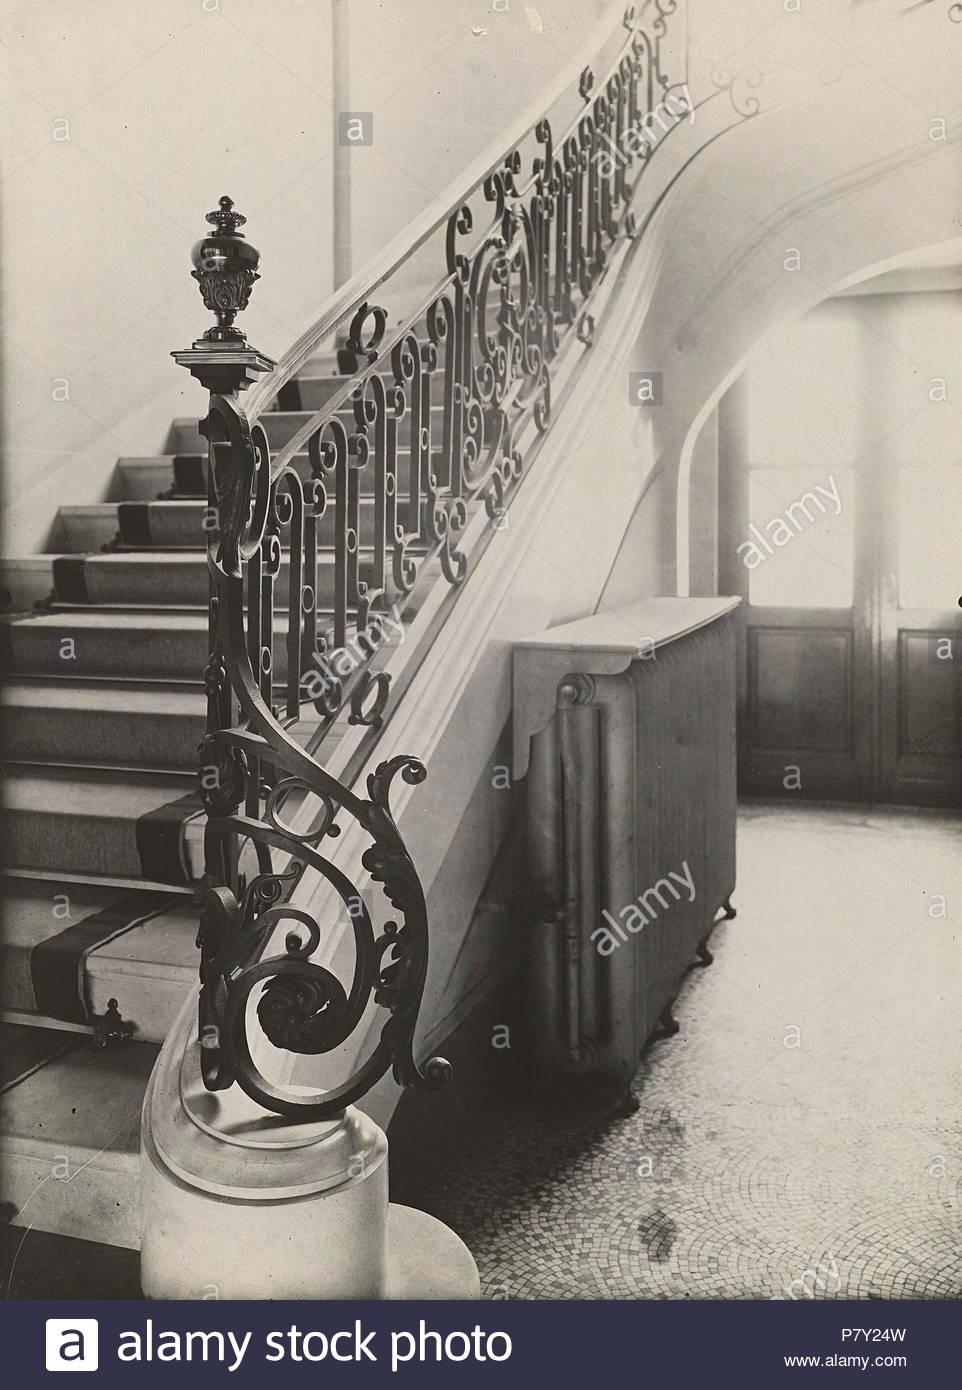 Interieur mit Treppen, Anonym, C. 1900 - C. 1920 Stockfoto, Bild ...